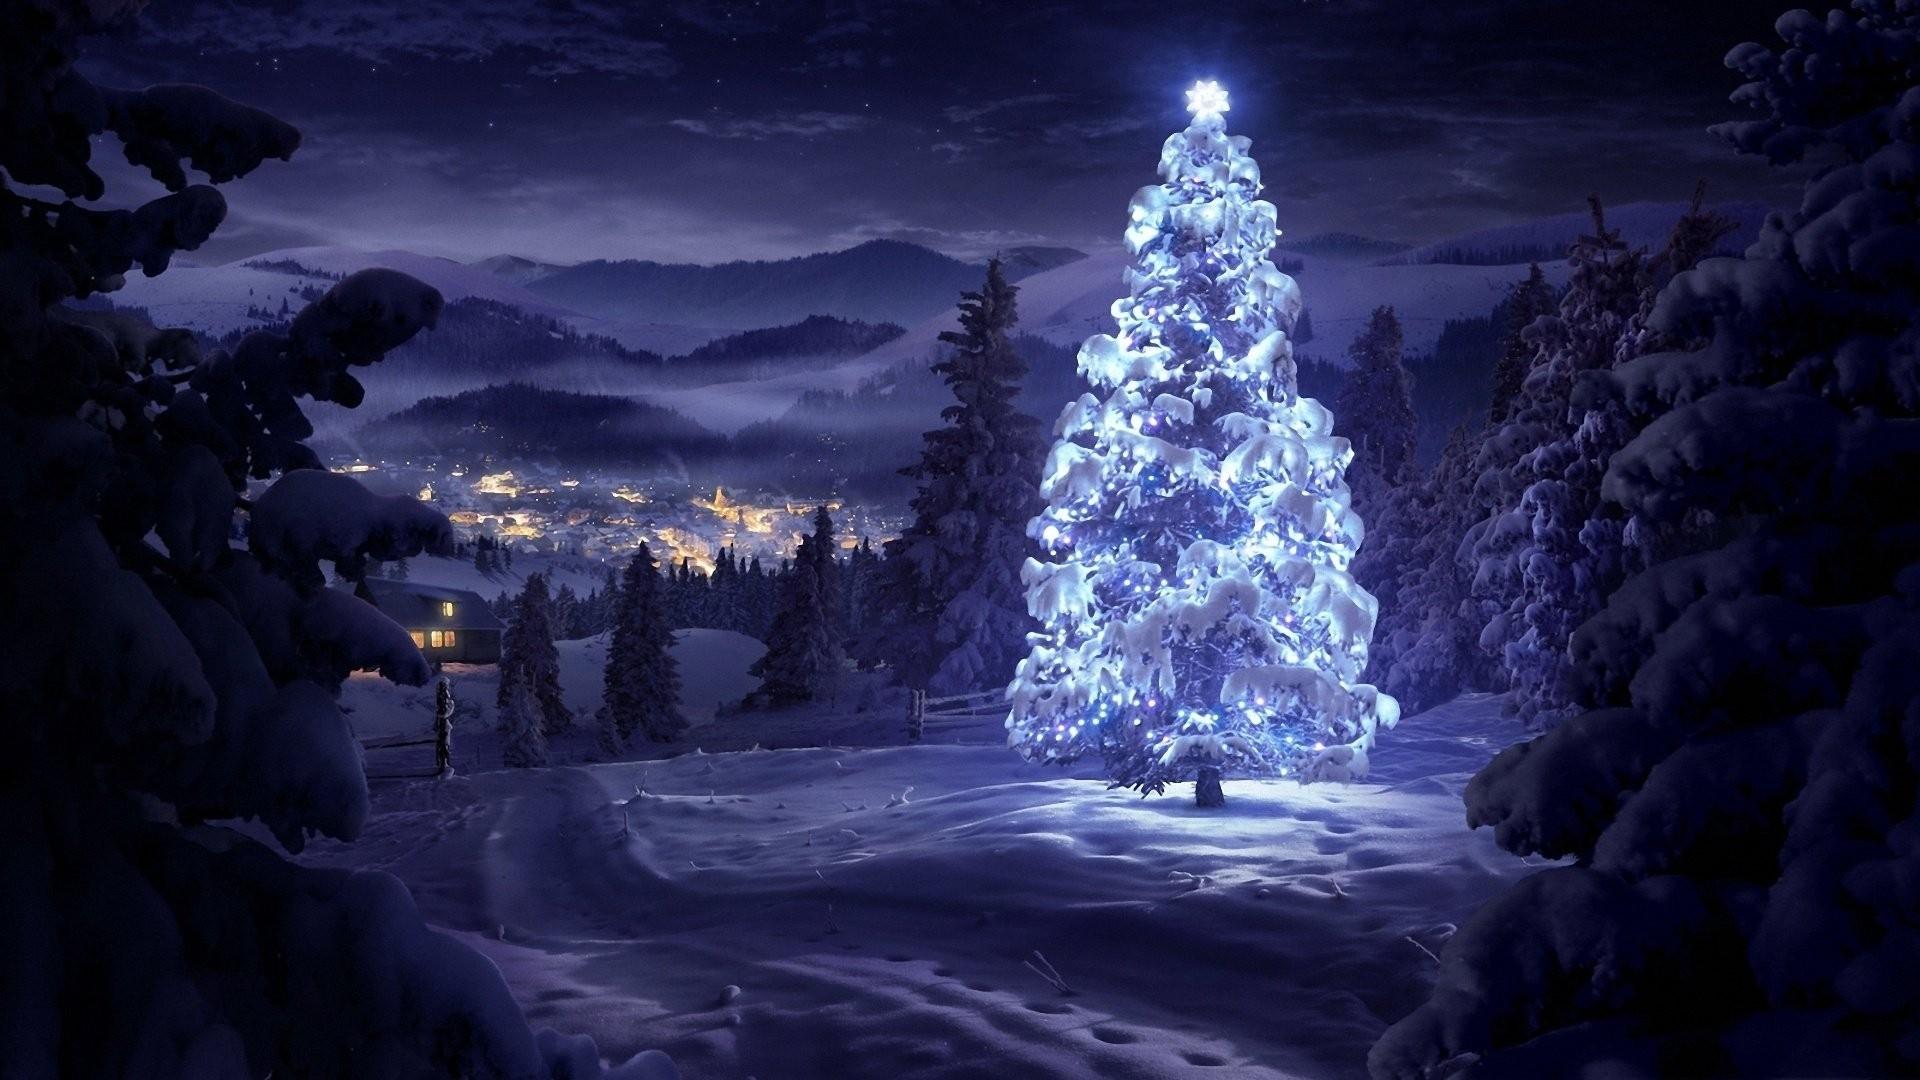 Auguri di Buon Natale!!! - Accademia A.N. Skrjabin